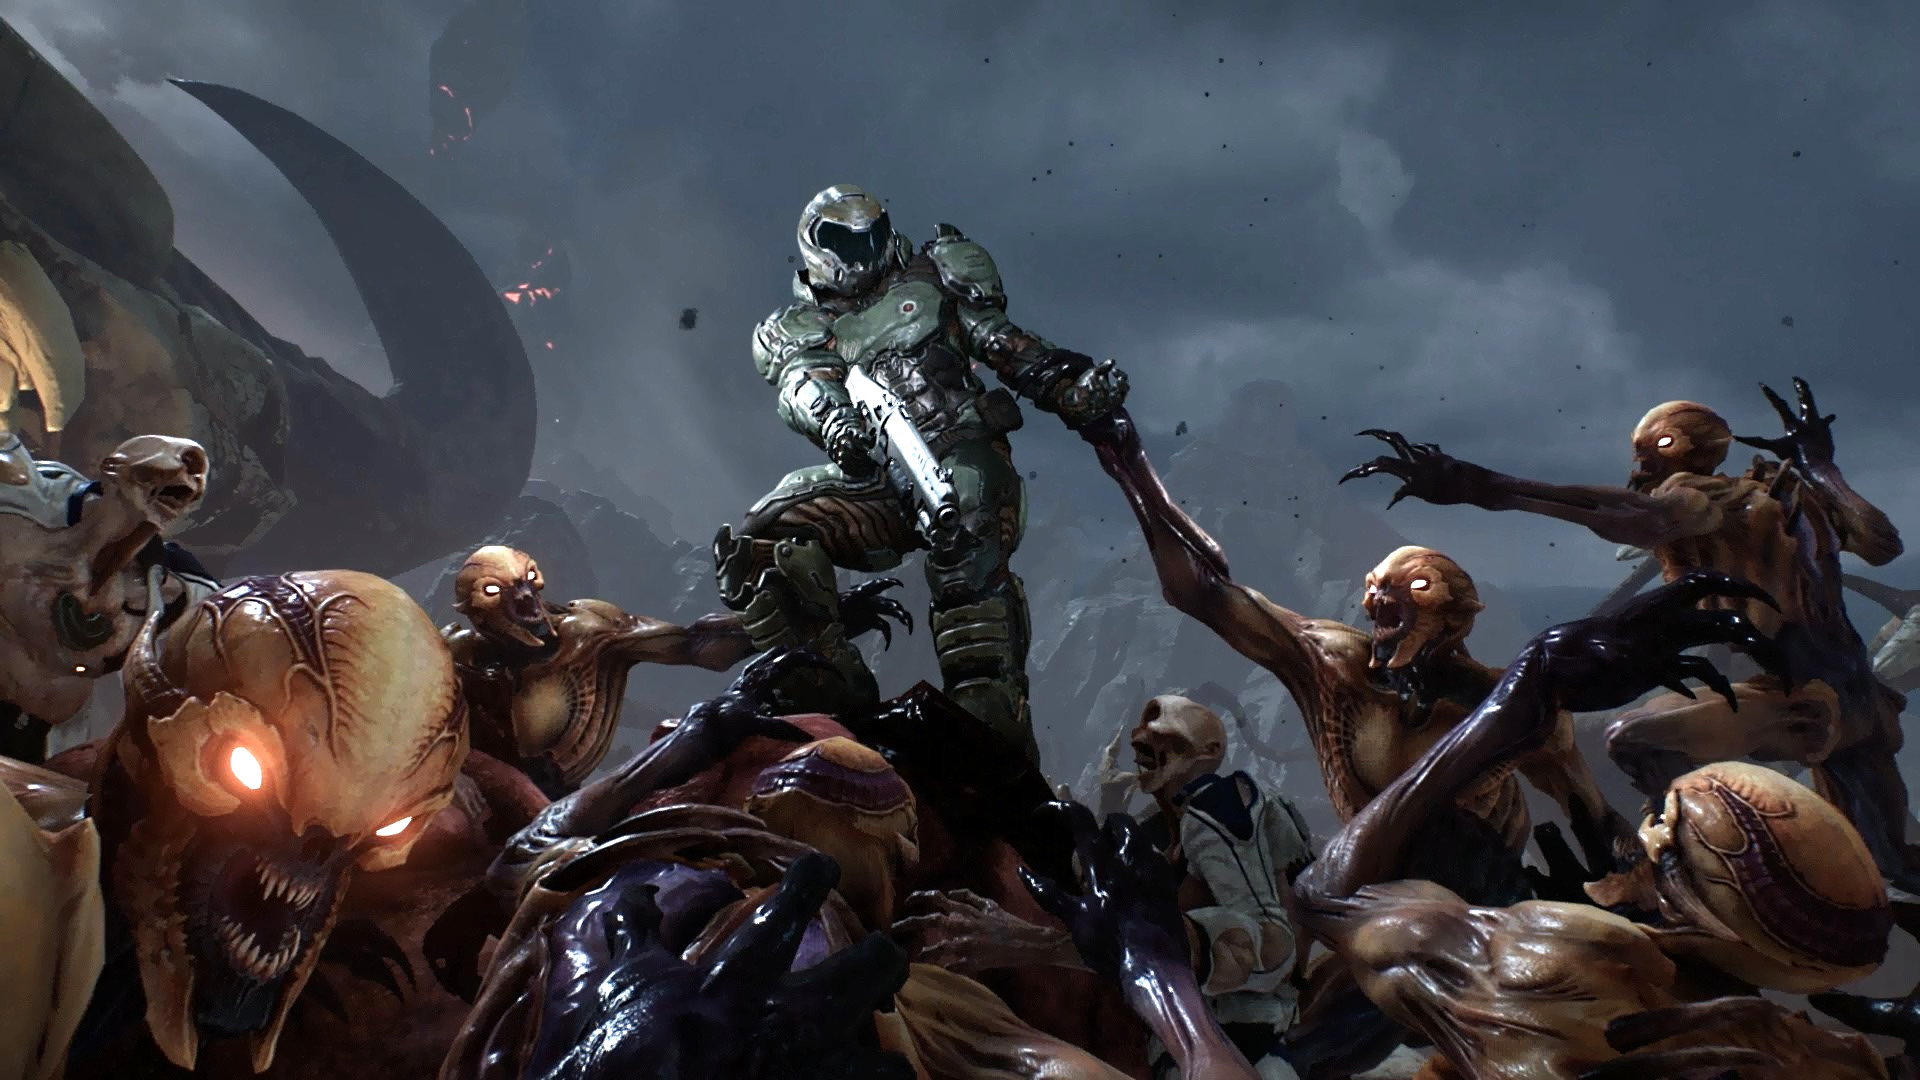 … games shooter first; 34 doom 4 wallpapers top ranked doom 4 wallpapers  pc dpw25 hd …